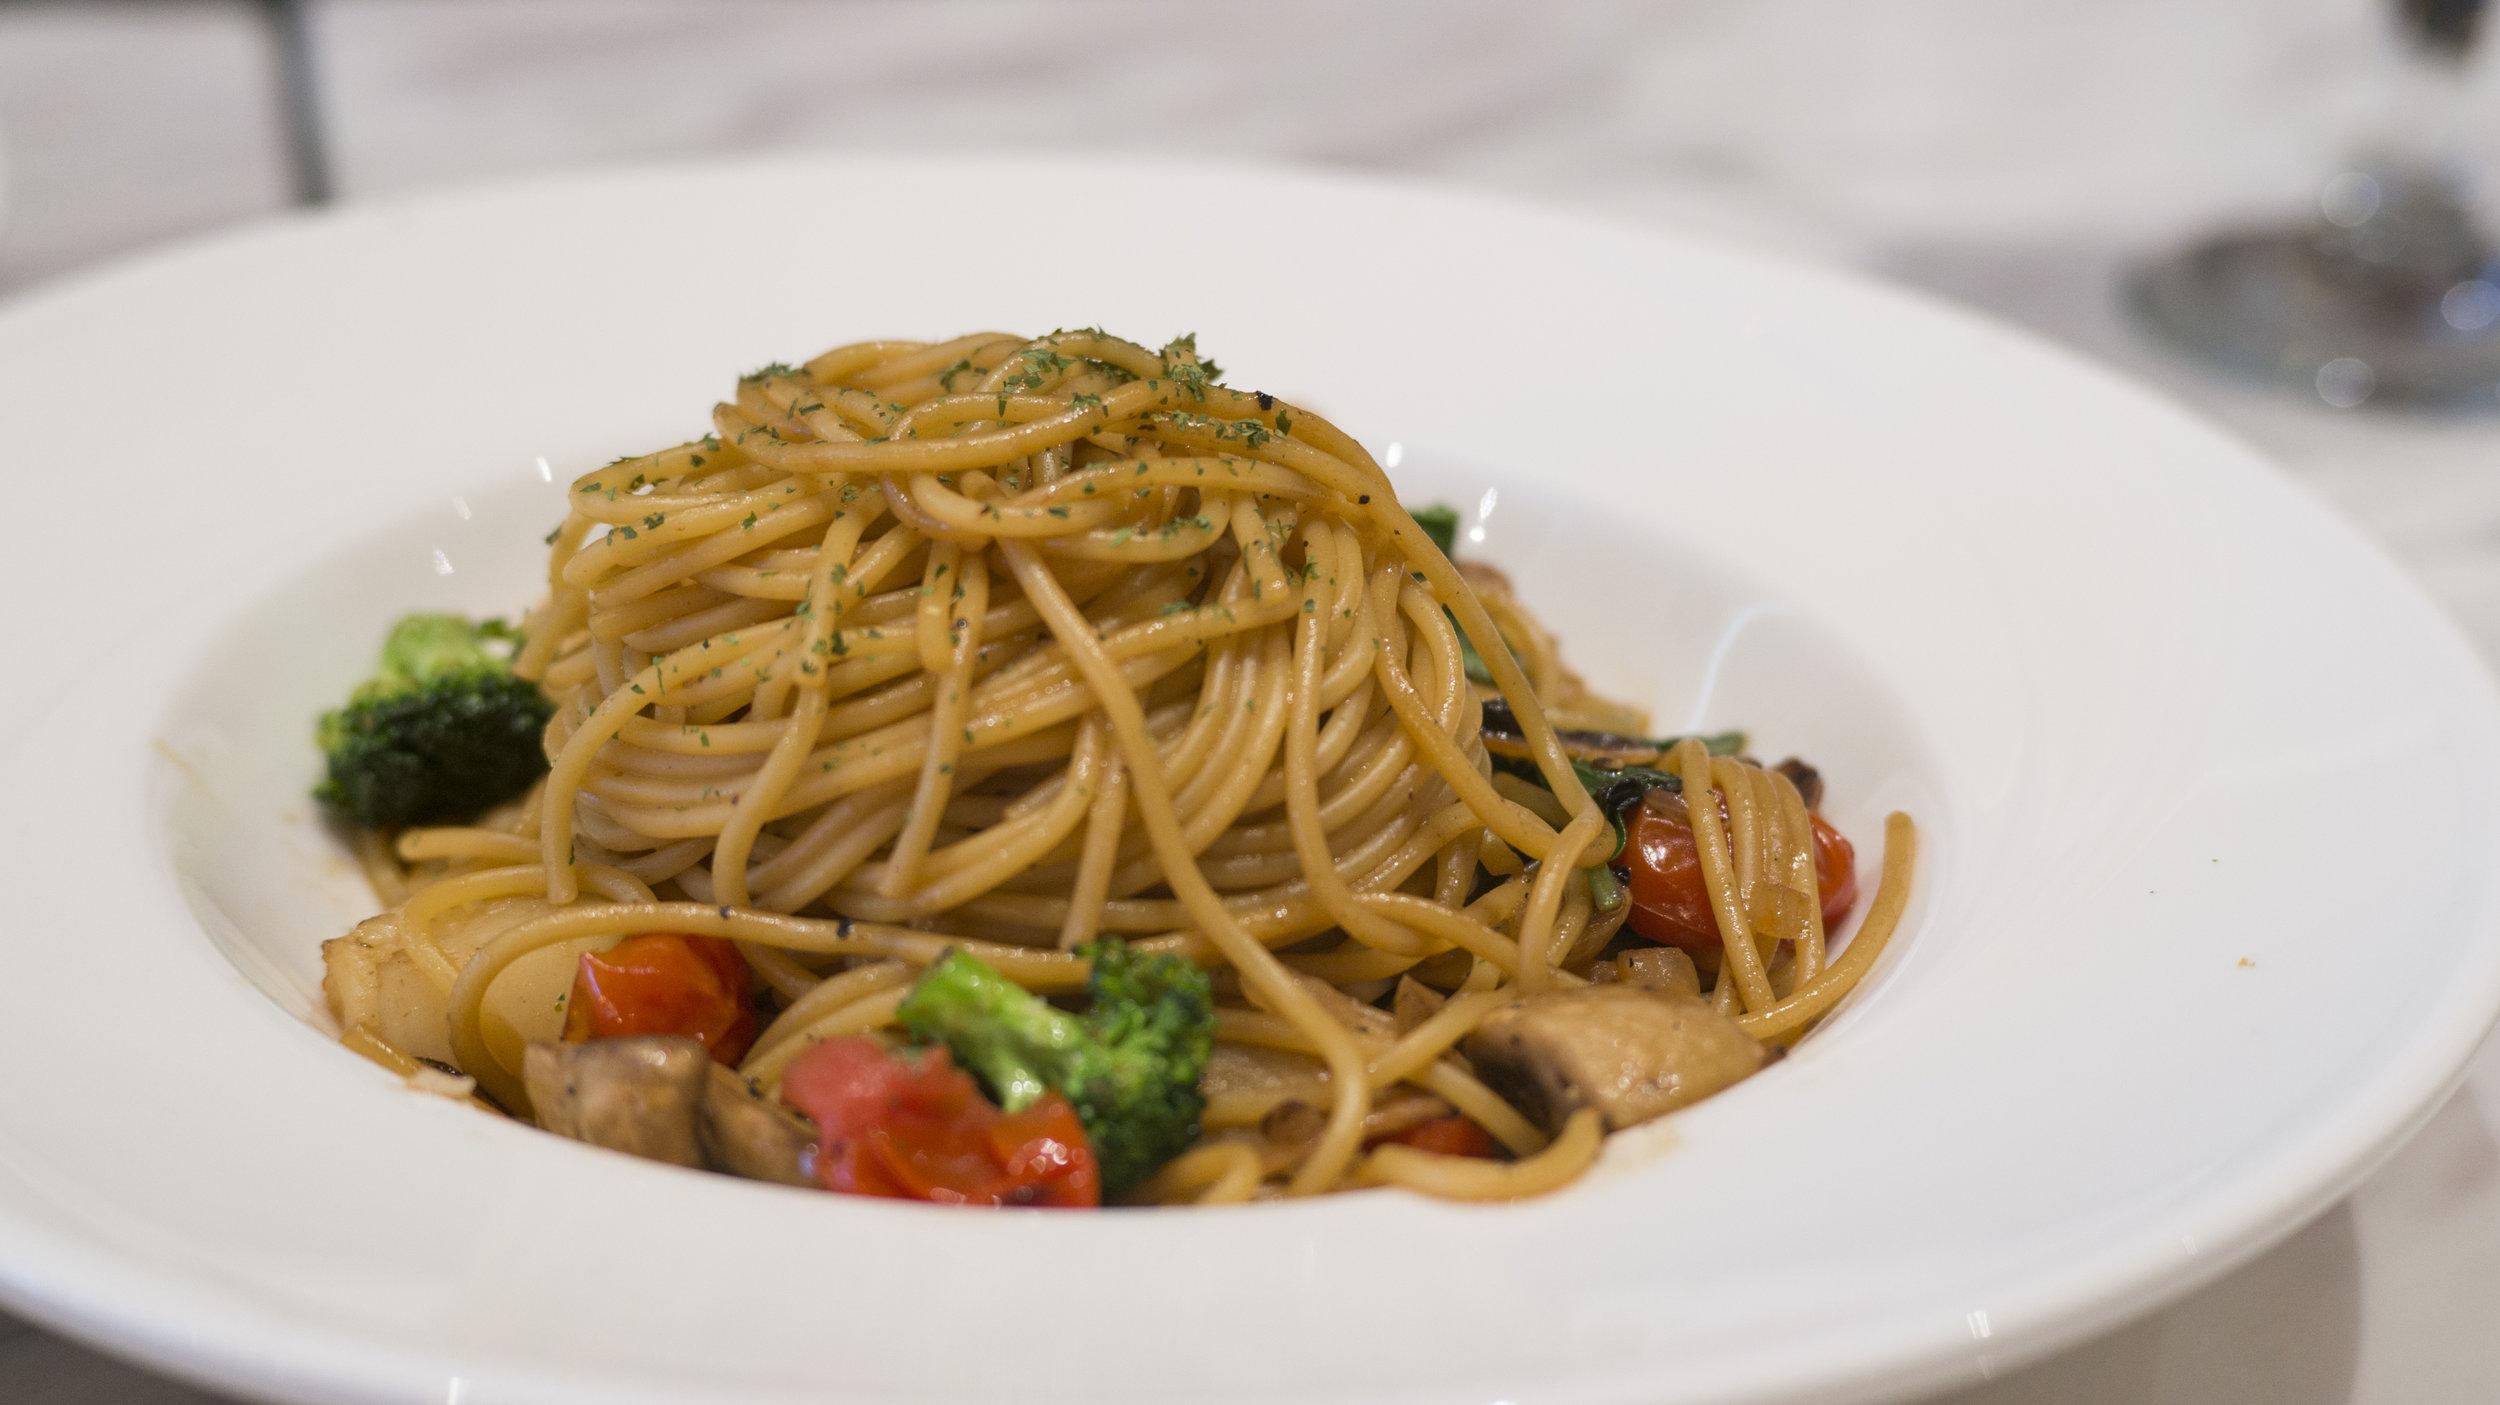 Spaghetti with Scallop and Shrimp | $13.5